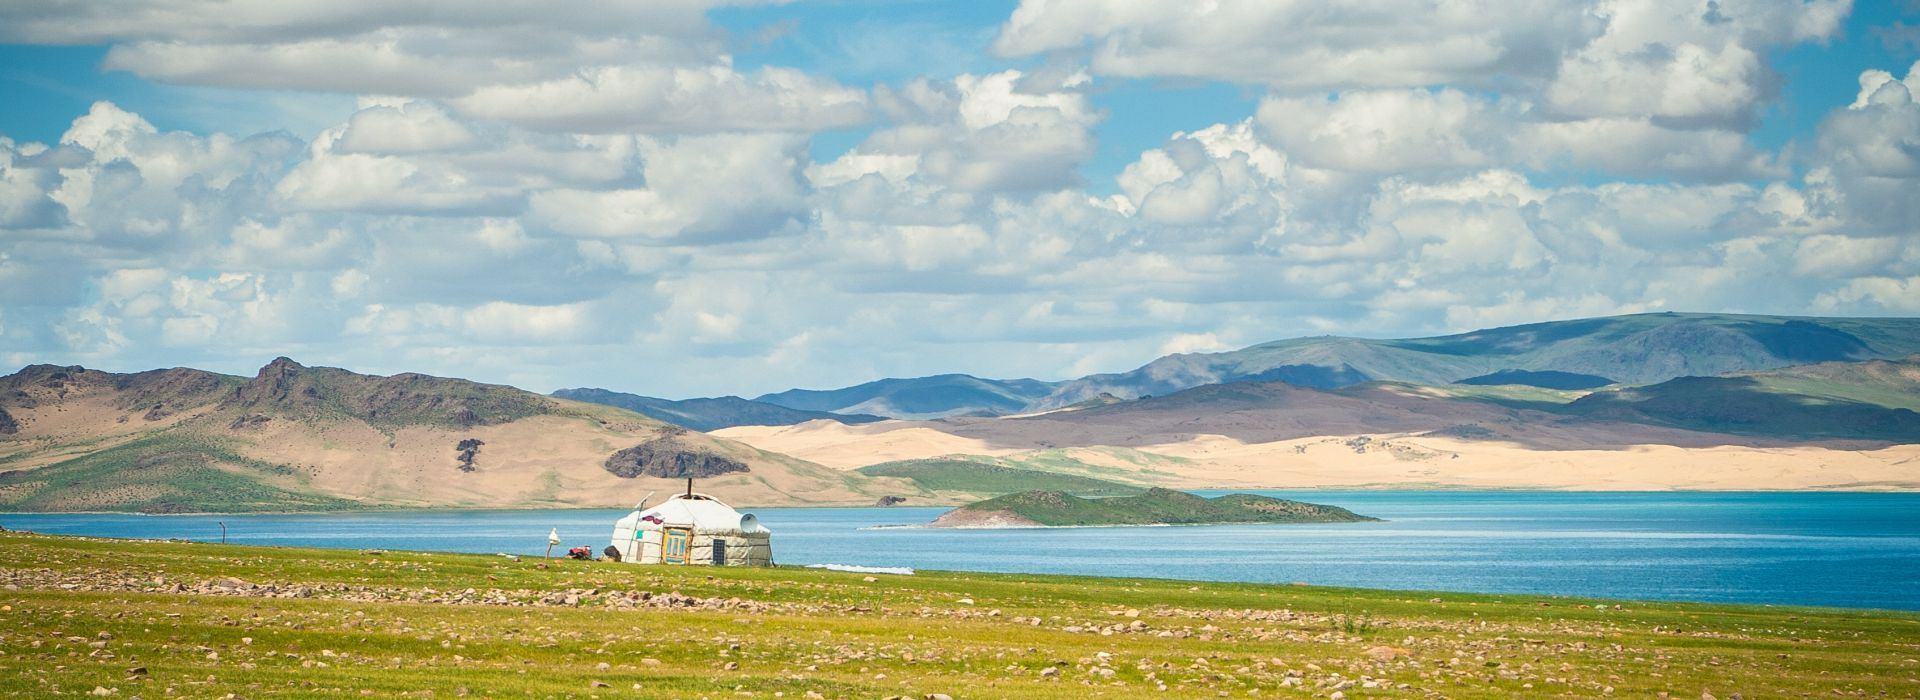 Natural landmarks sightseeing Tours in Ulaanbaatar